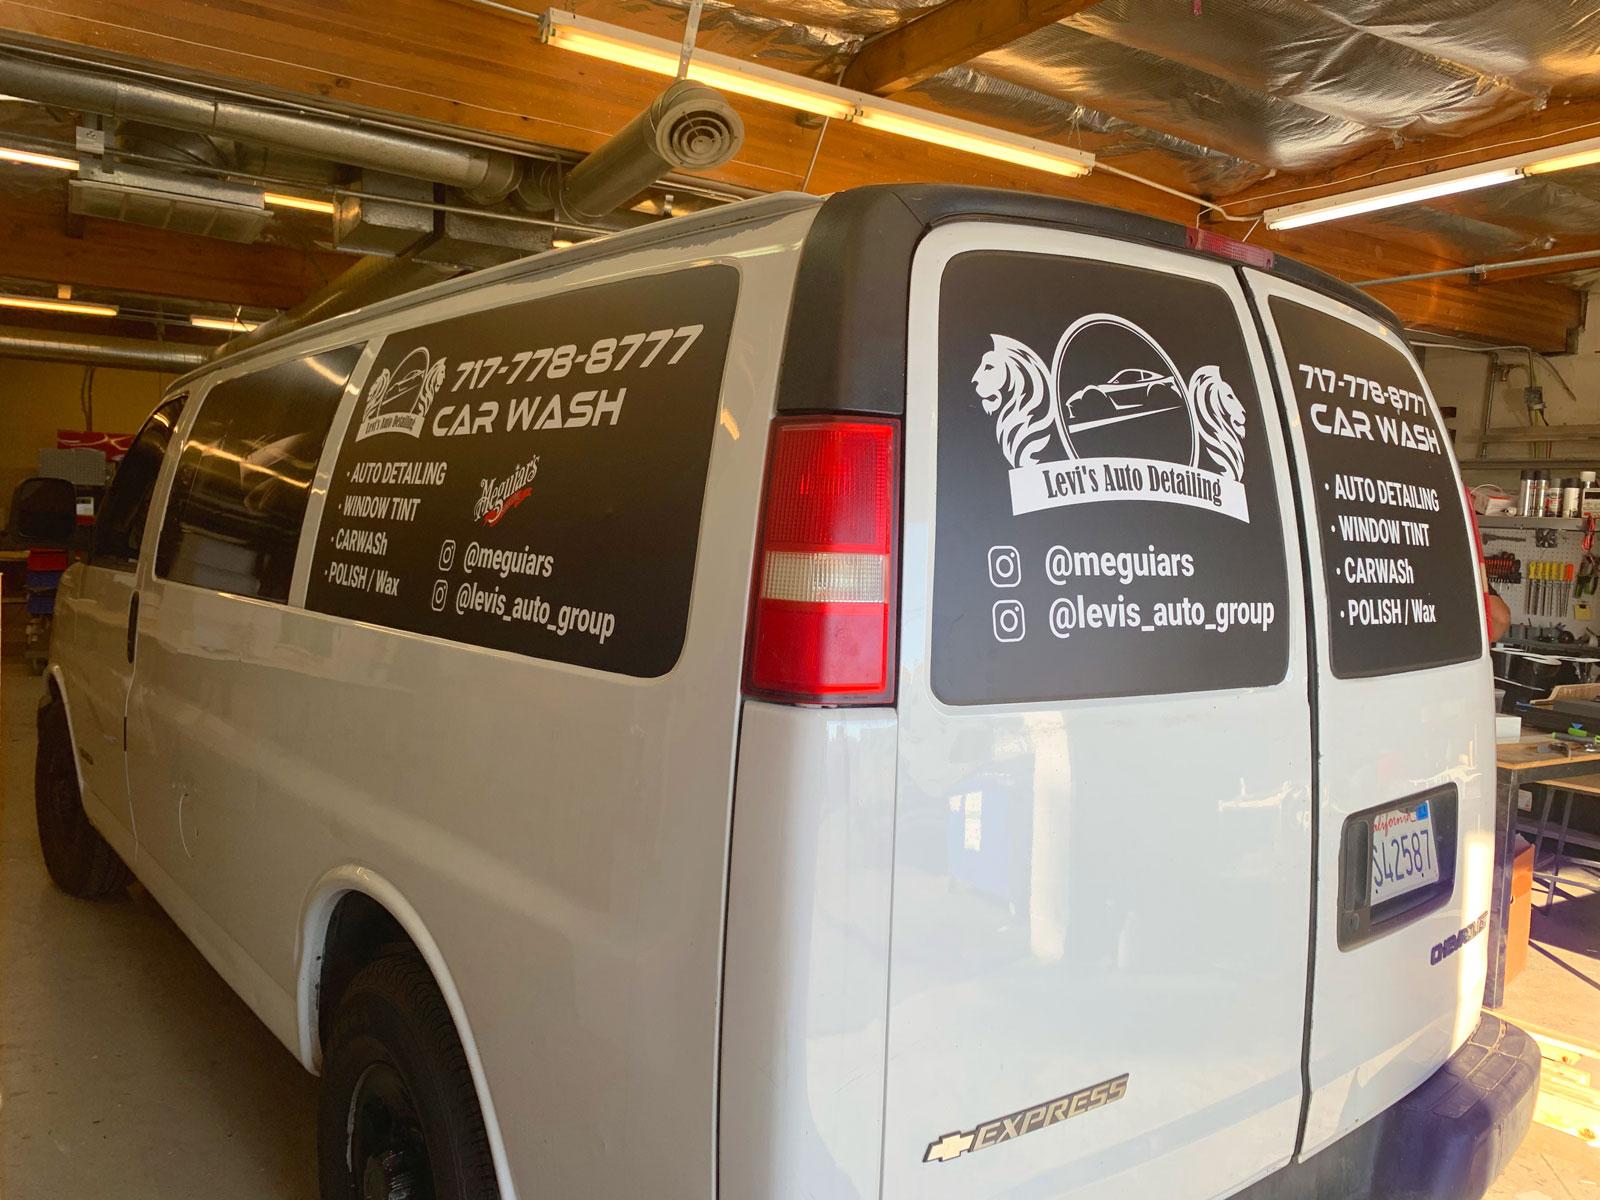 White van with black window wraps